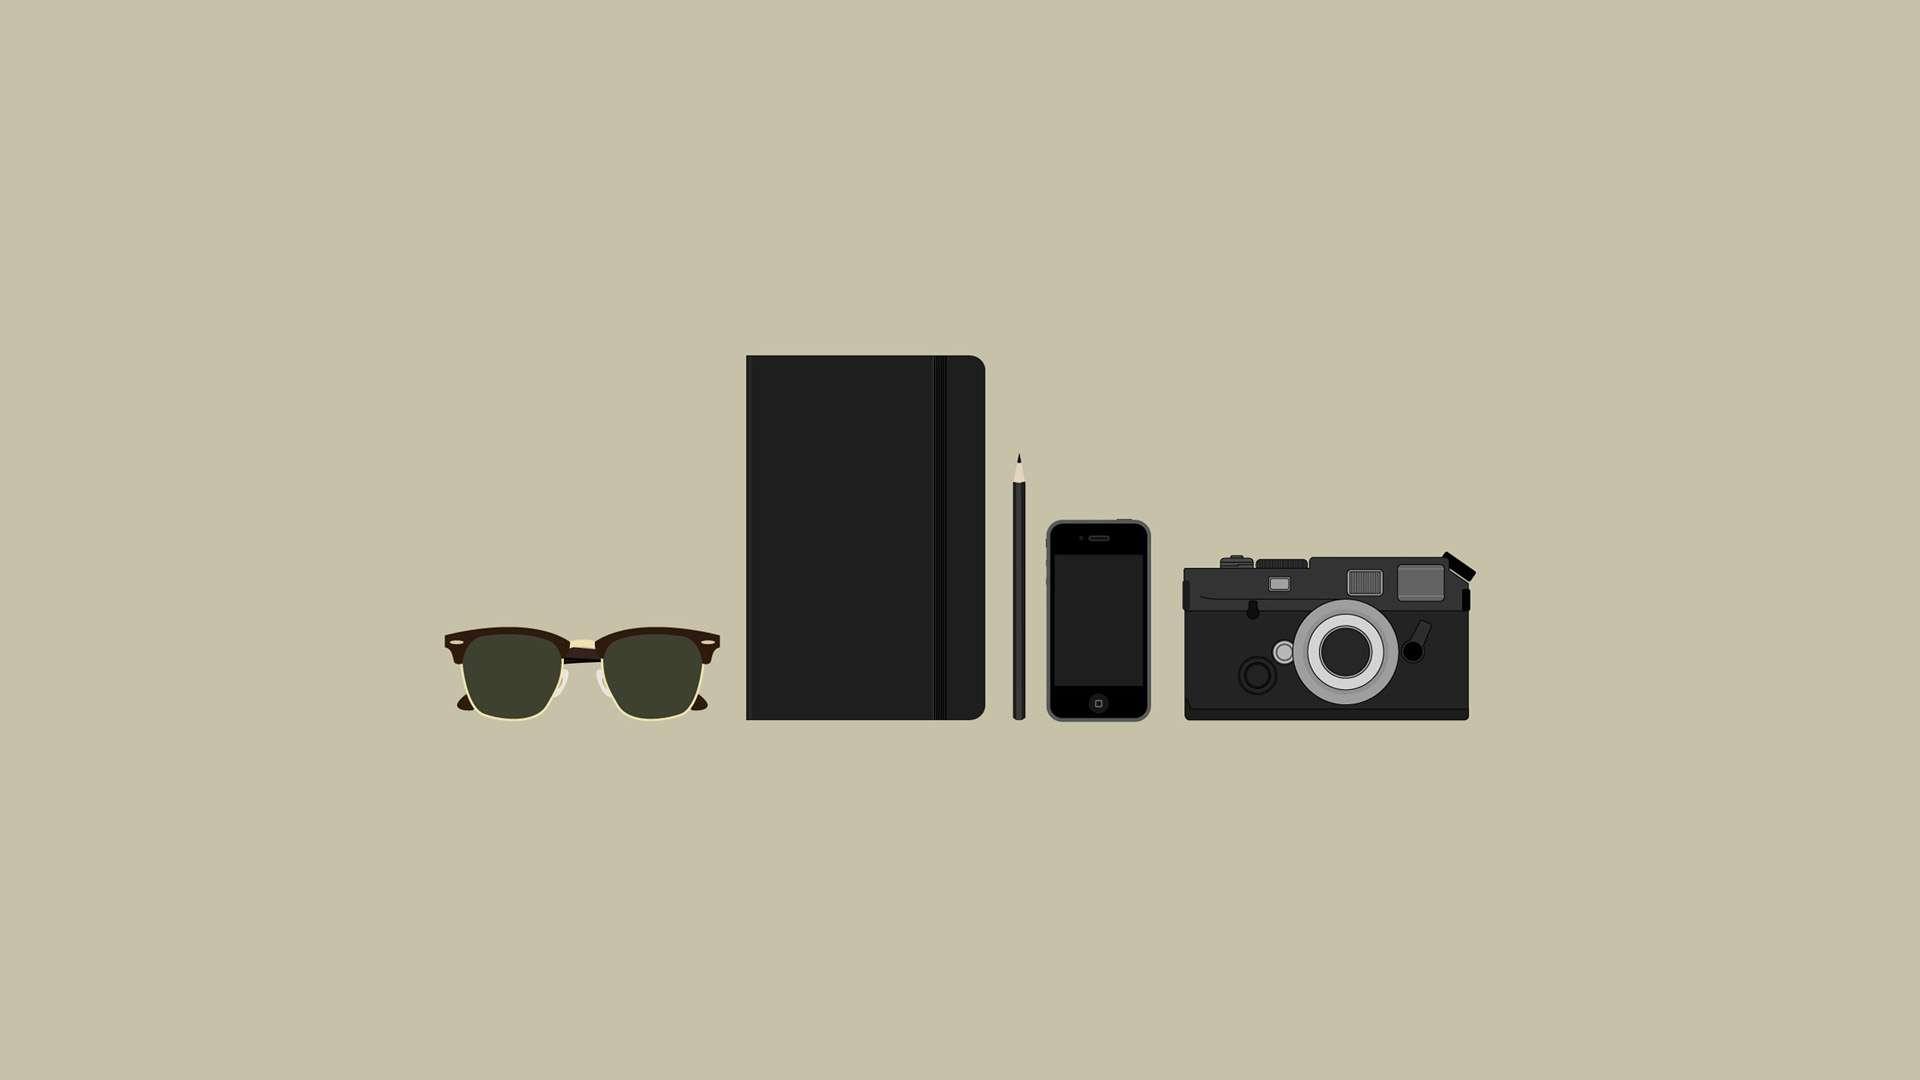 Hipster Gear HD Wallpaper FullHDWpp   Full HD Wallpapers 1920x1080 1920x1080